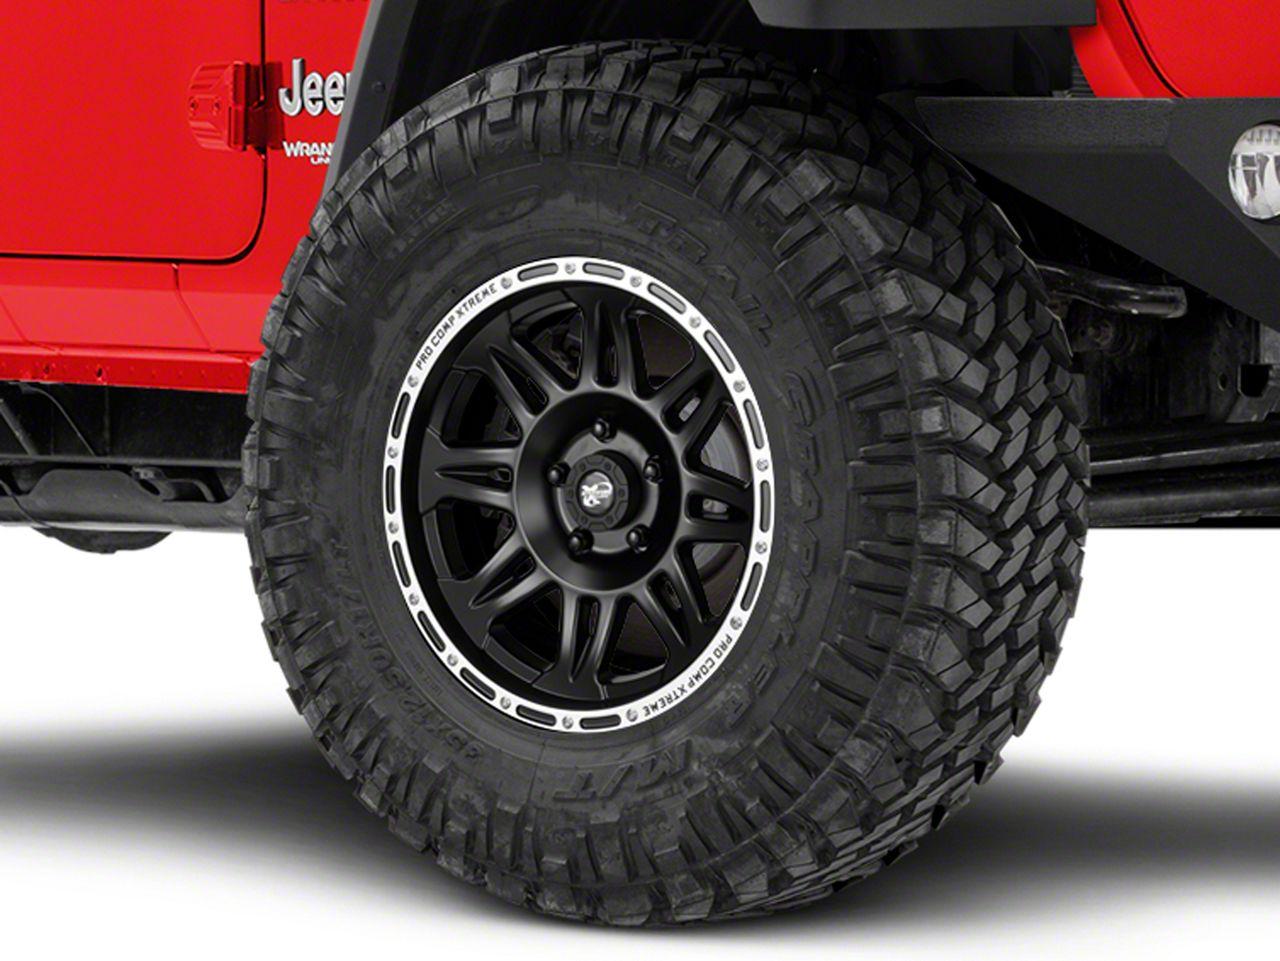 Pro Comp Alloy Series 7105 Flat Black Wheel - 17x9 (18-19 Jeep Wrangler JL)